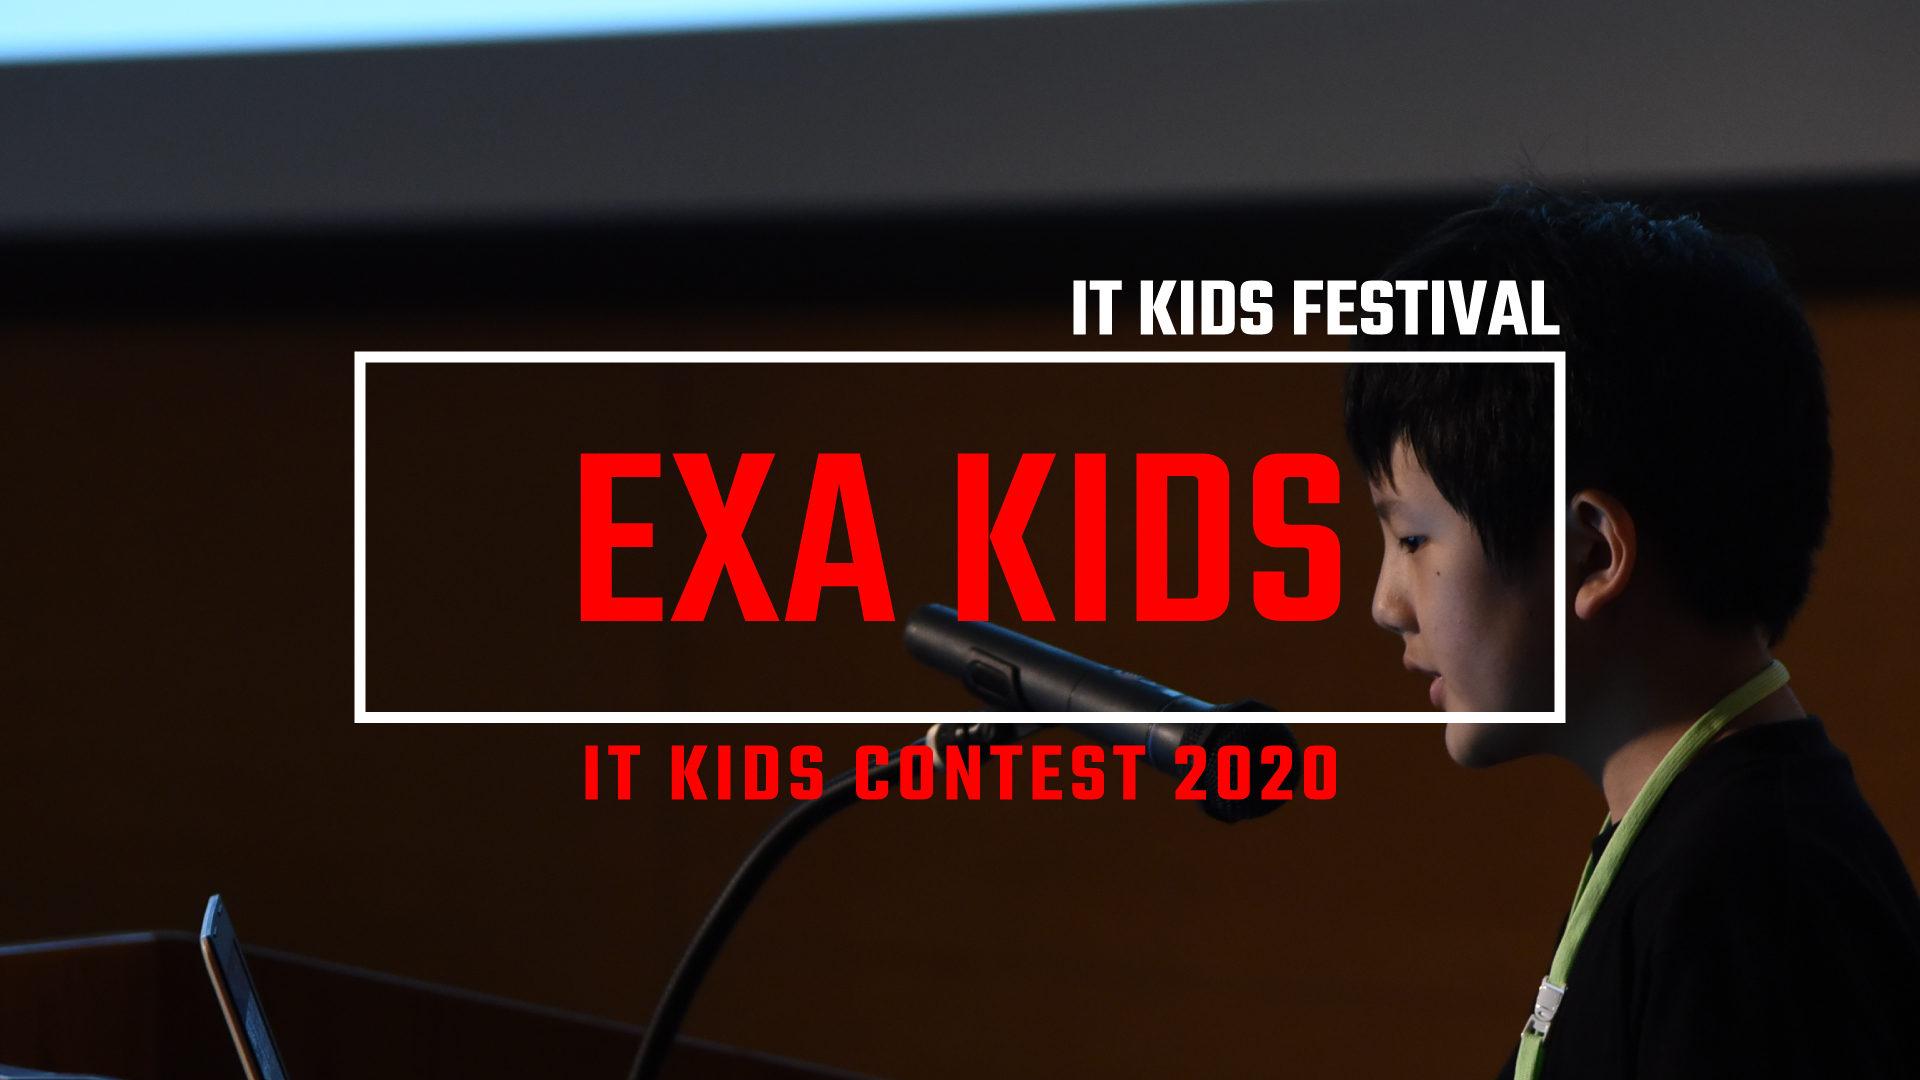 EXA KIDS(エクサキッズ)